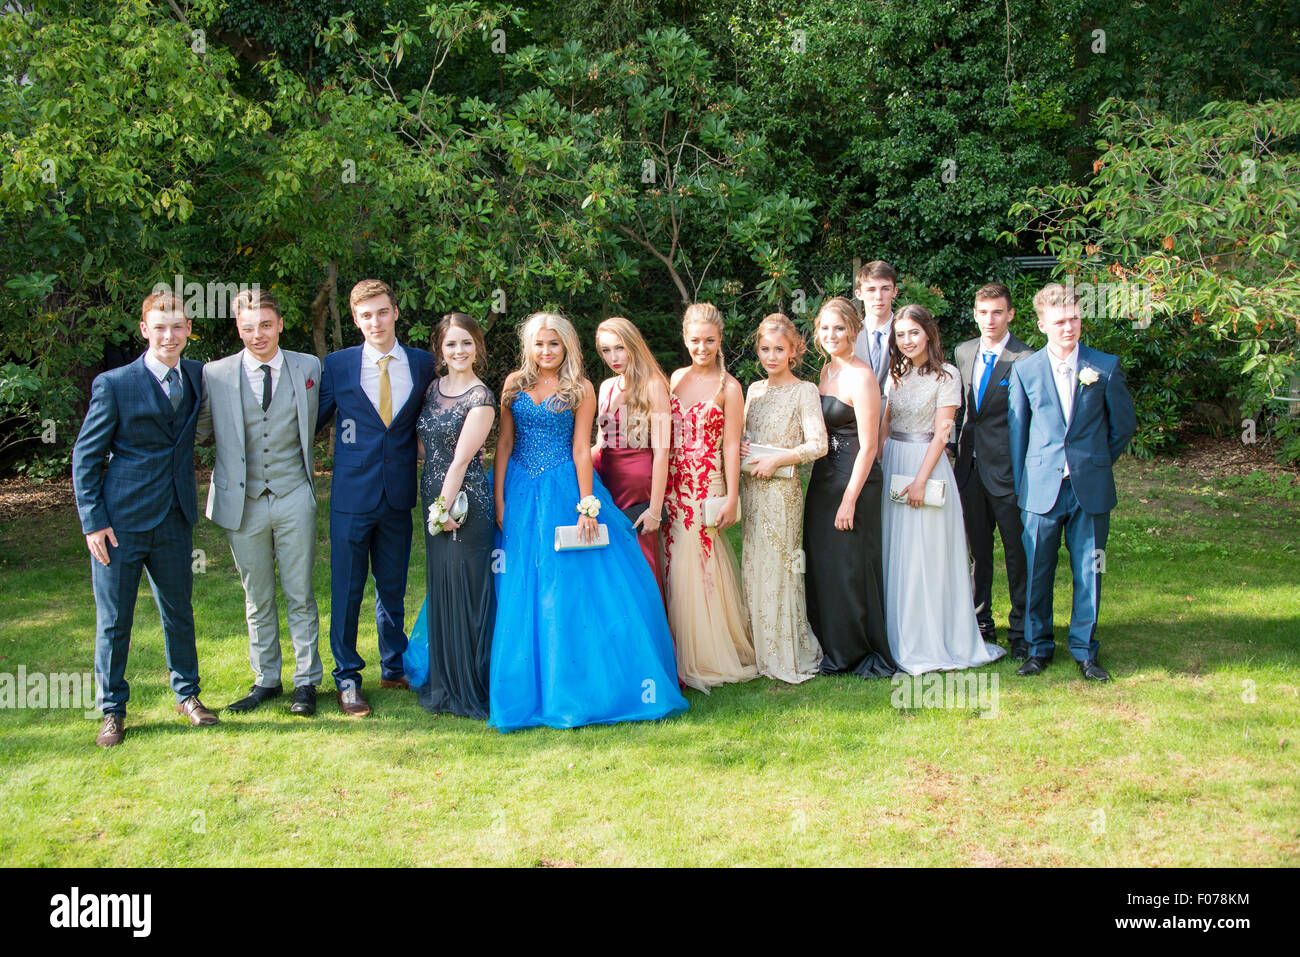 Prom Dresses On Boys